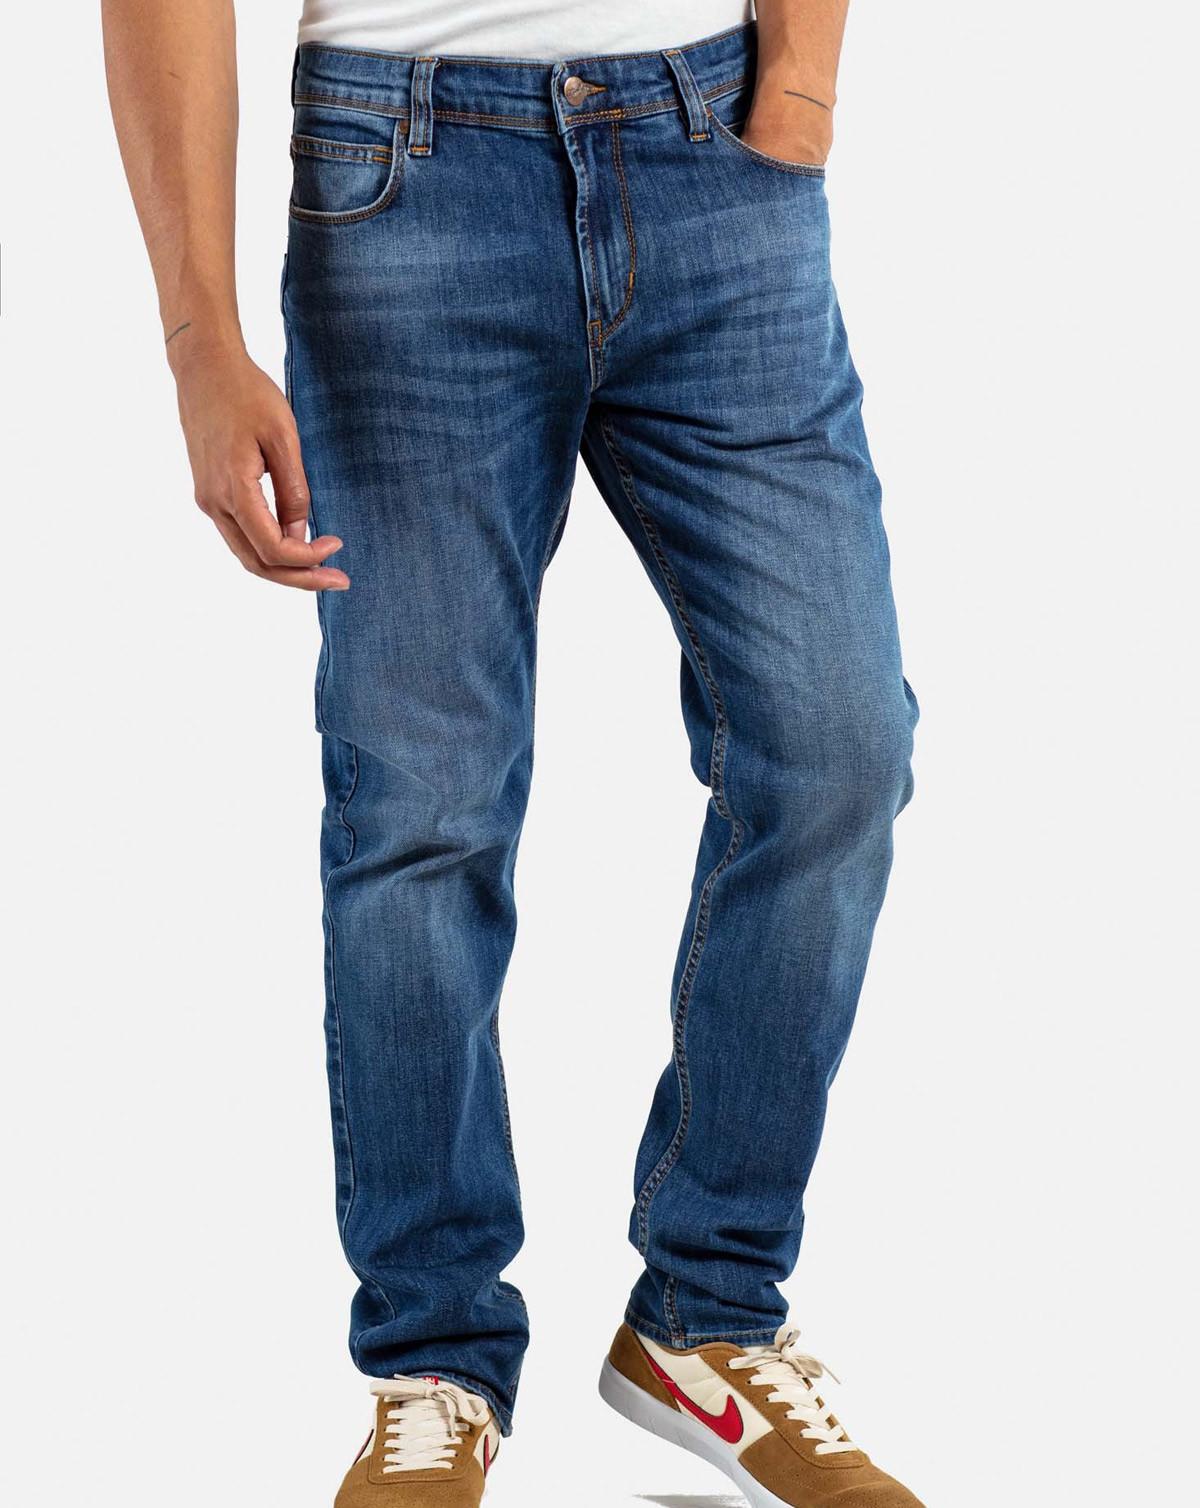 Reell Nova 2 Jeans (Washed Blue, W38 / L34)